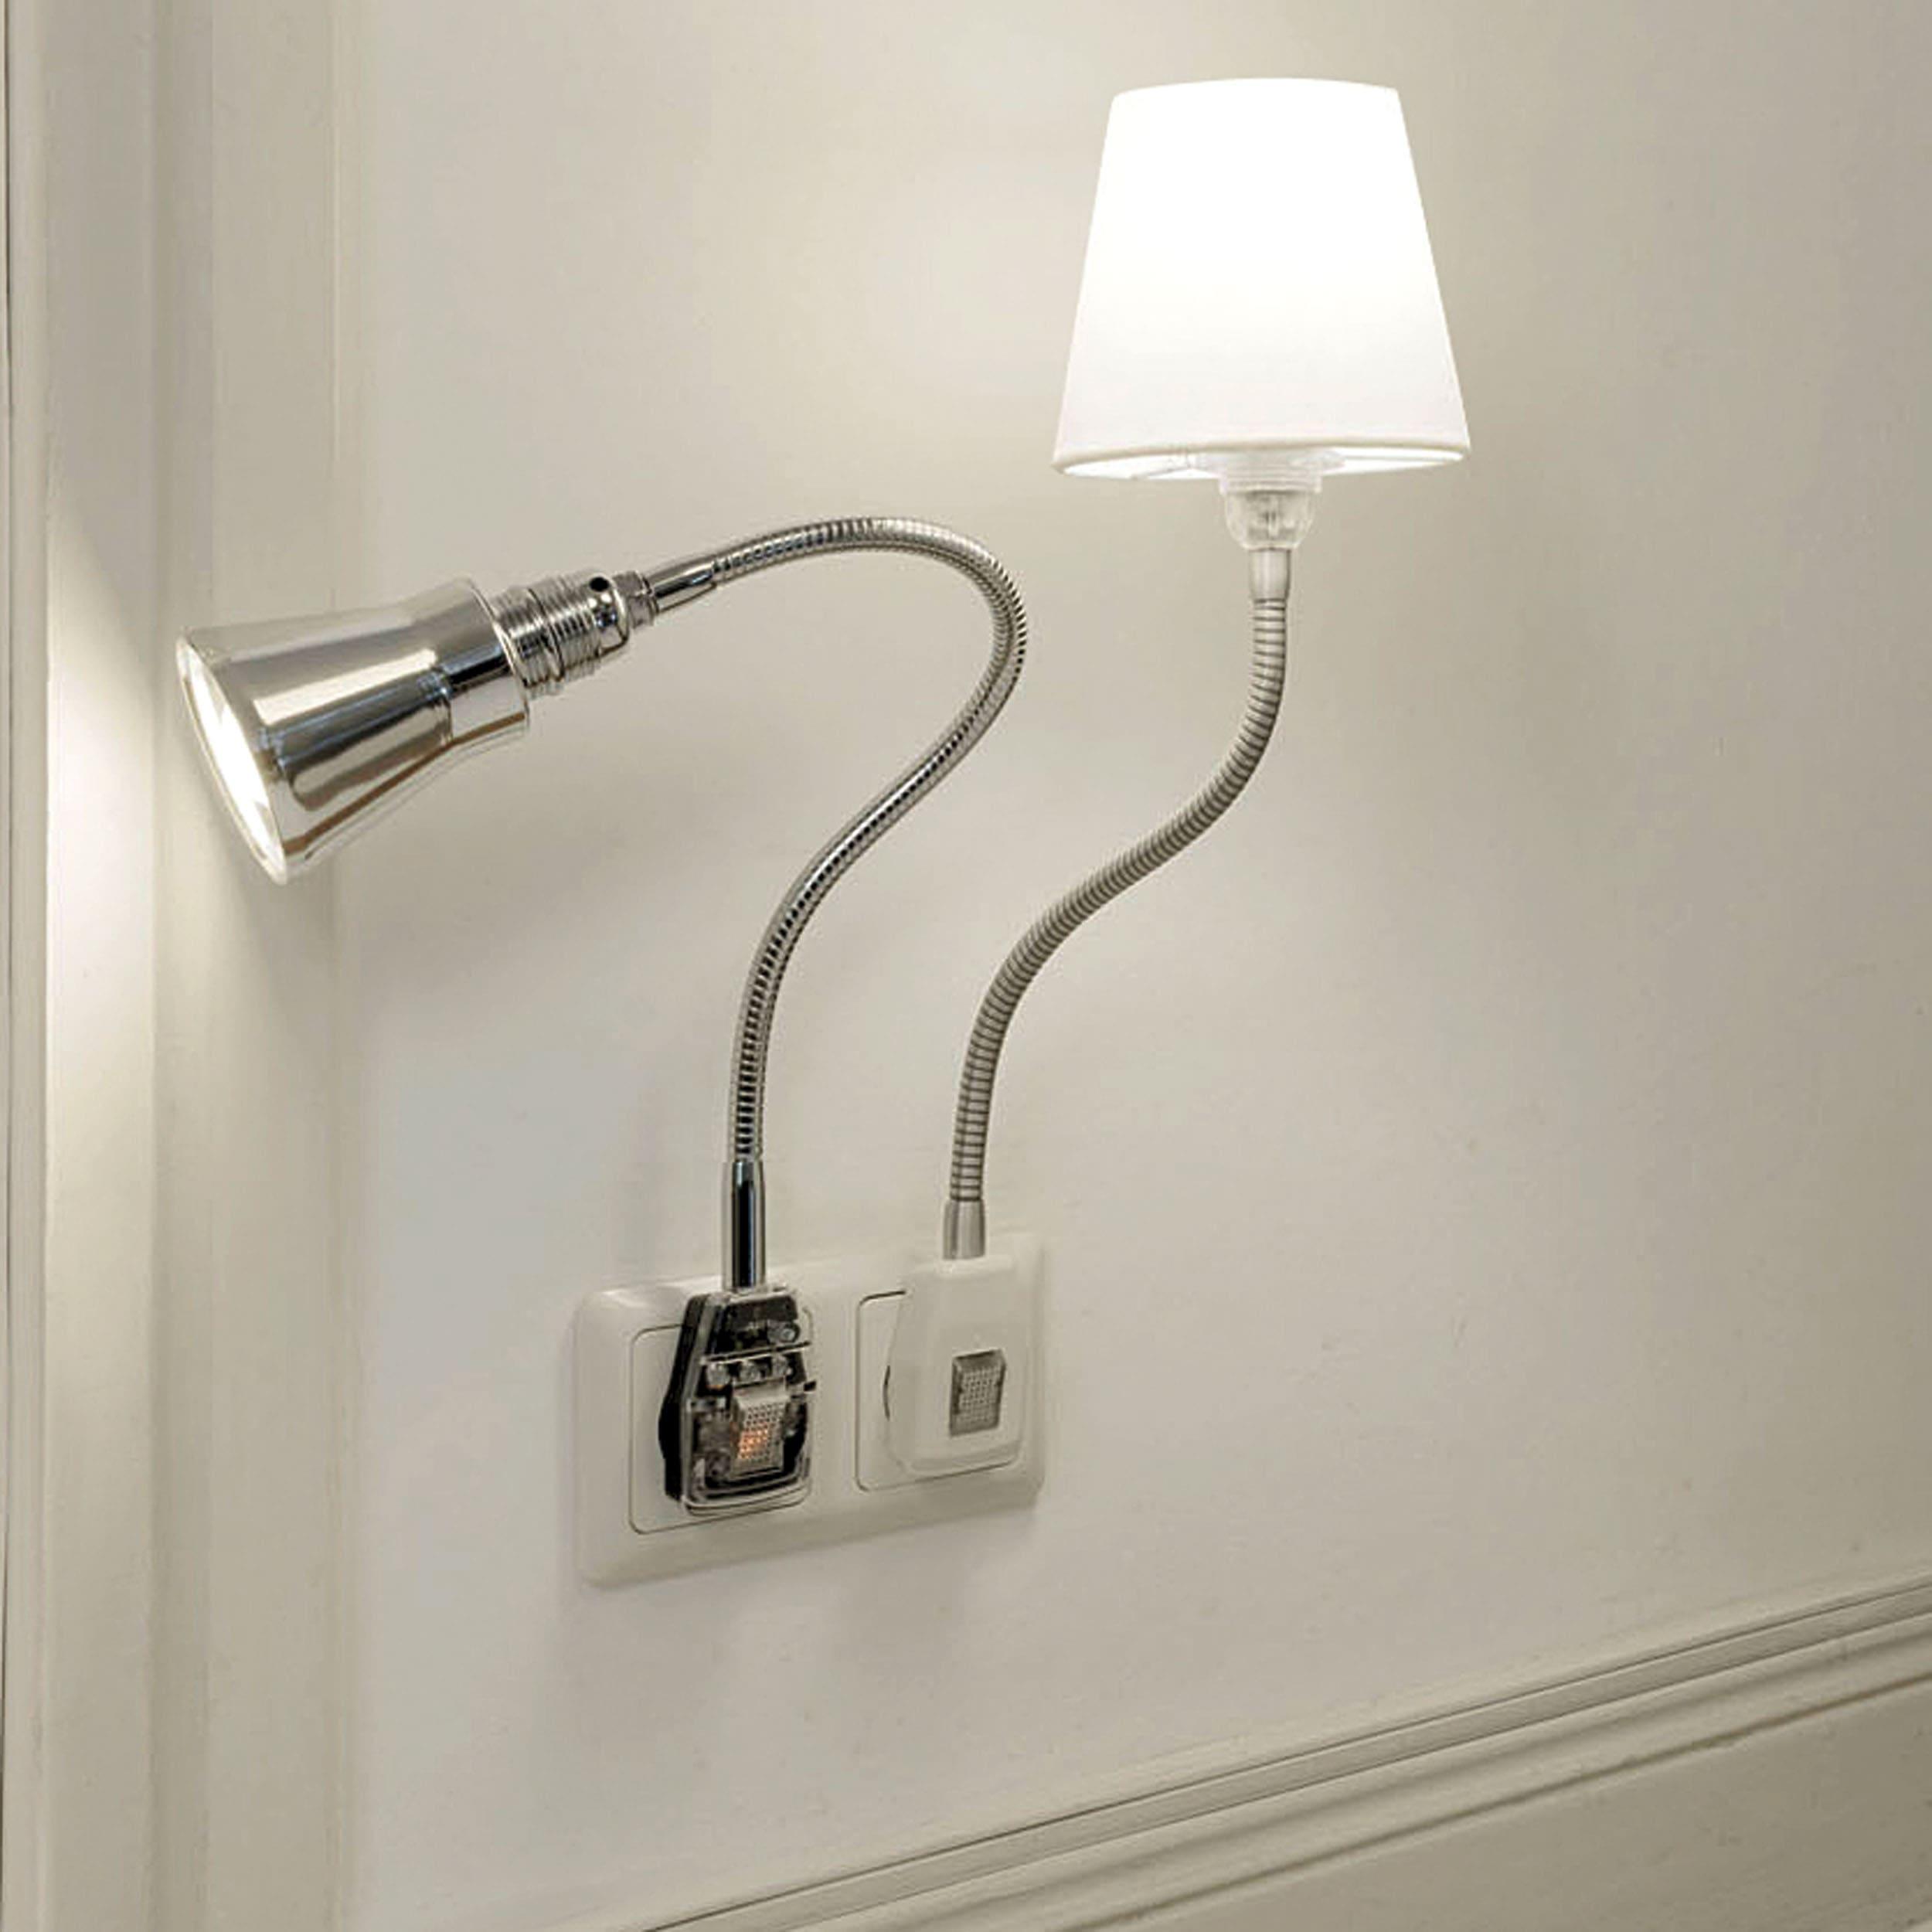 Glühwürmchen DeLight LED m. glattem Textilschirm